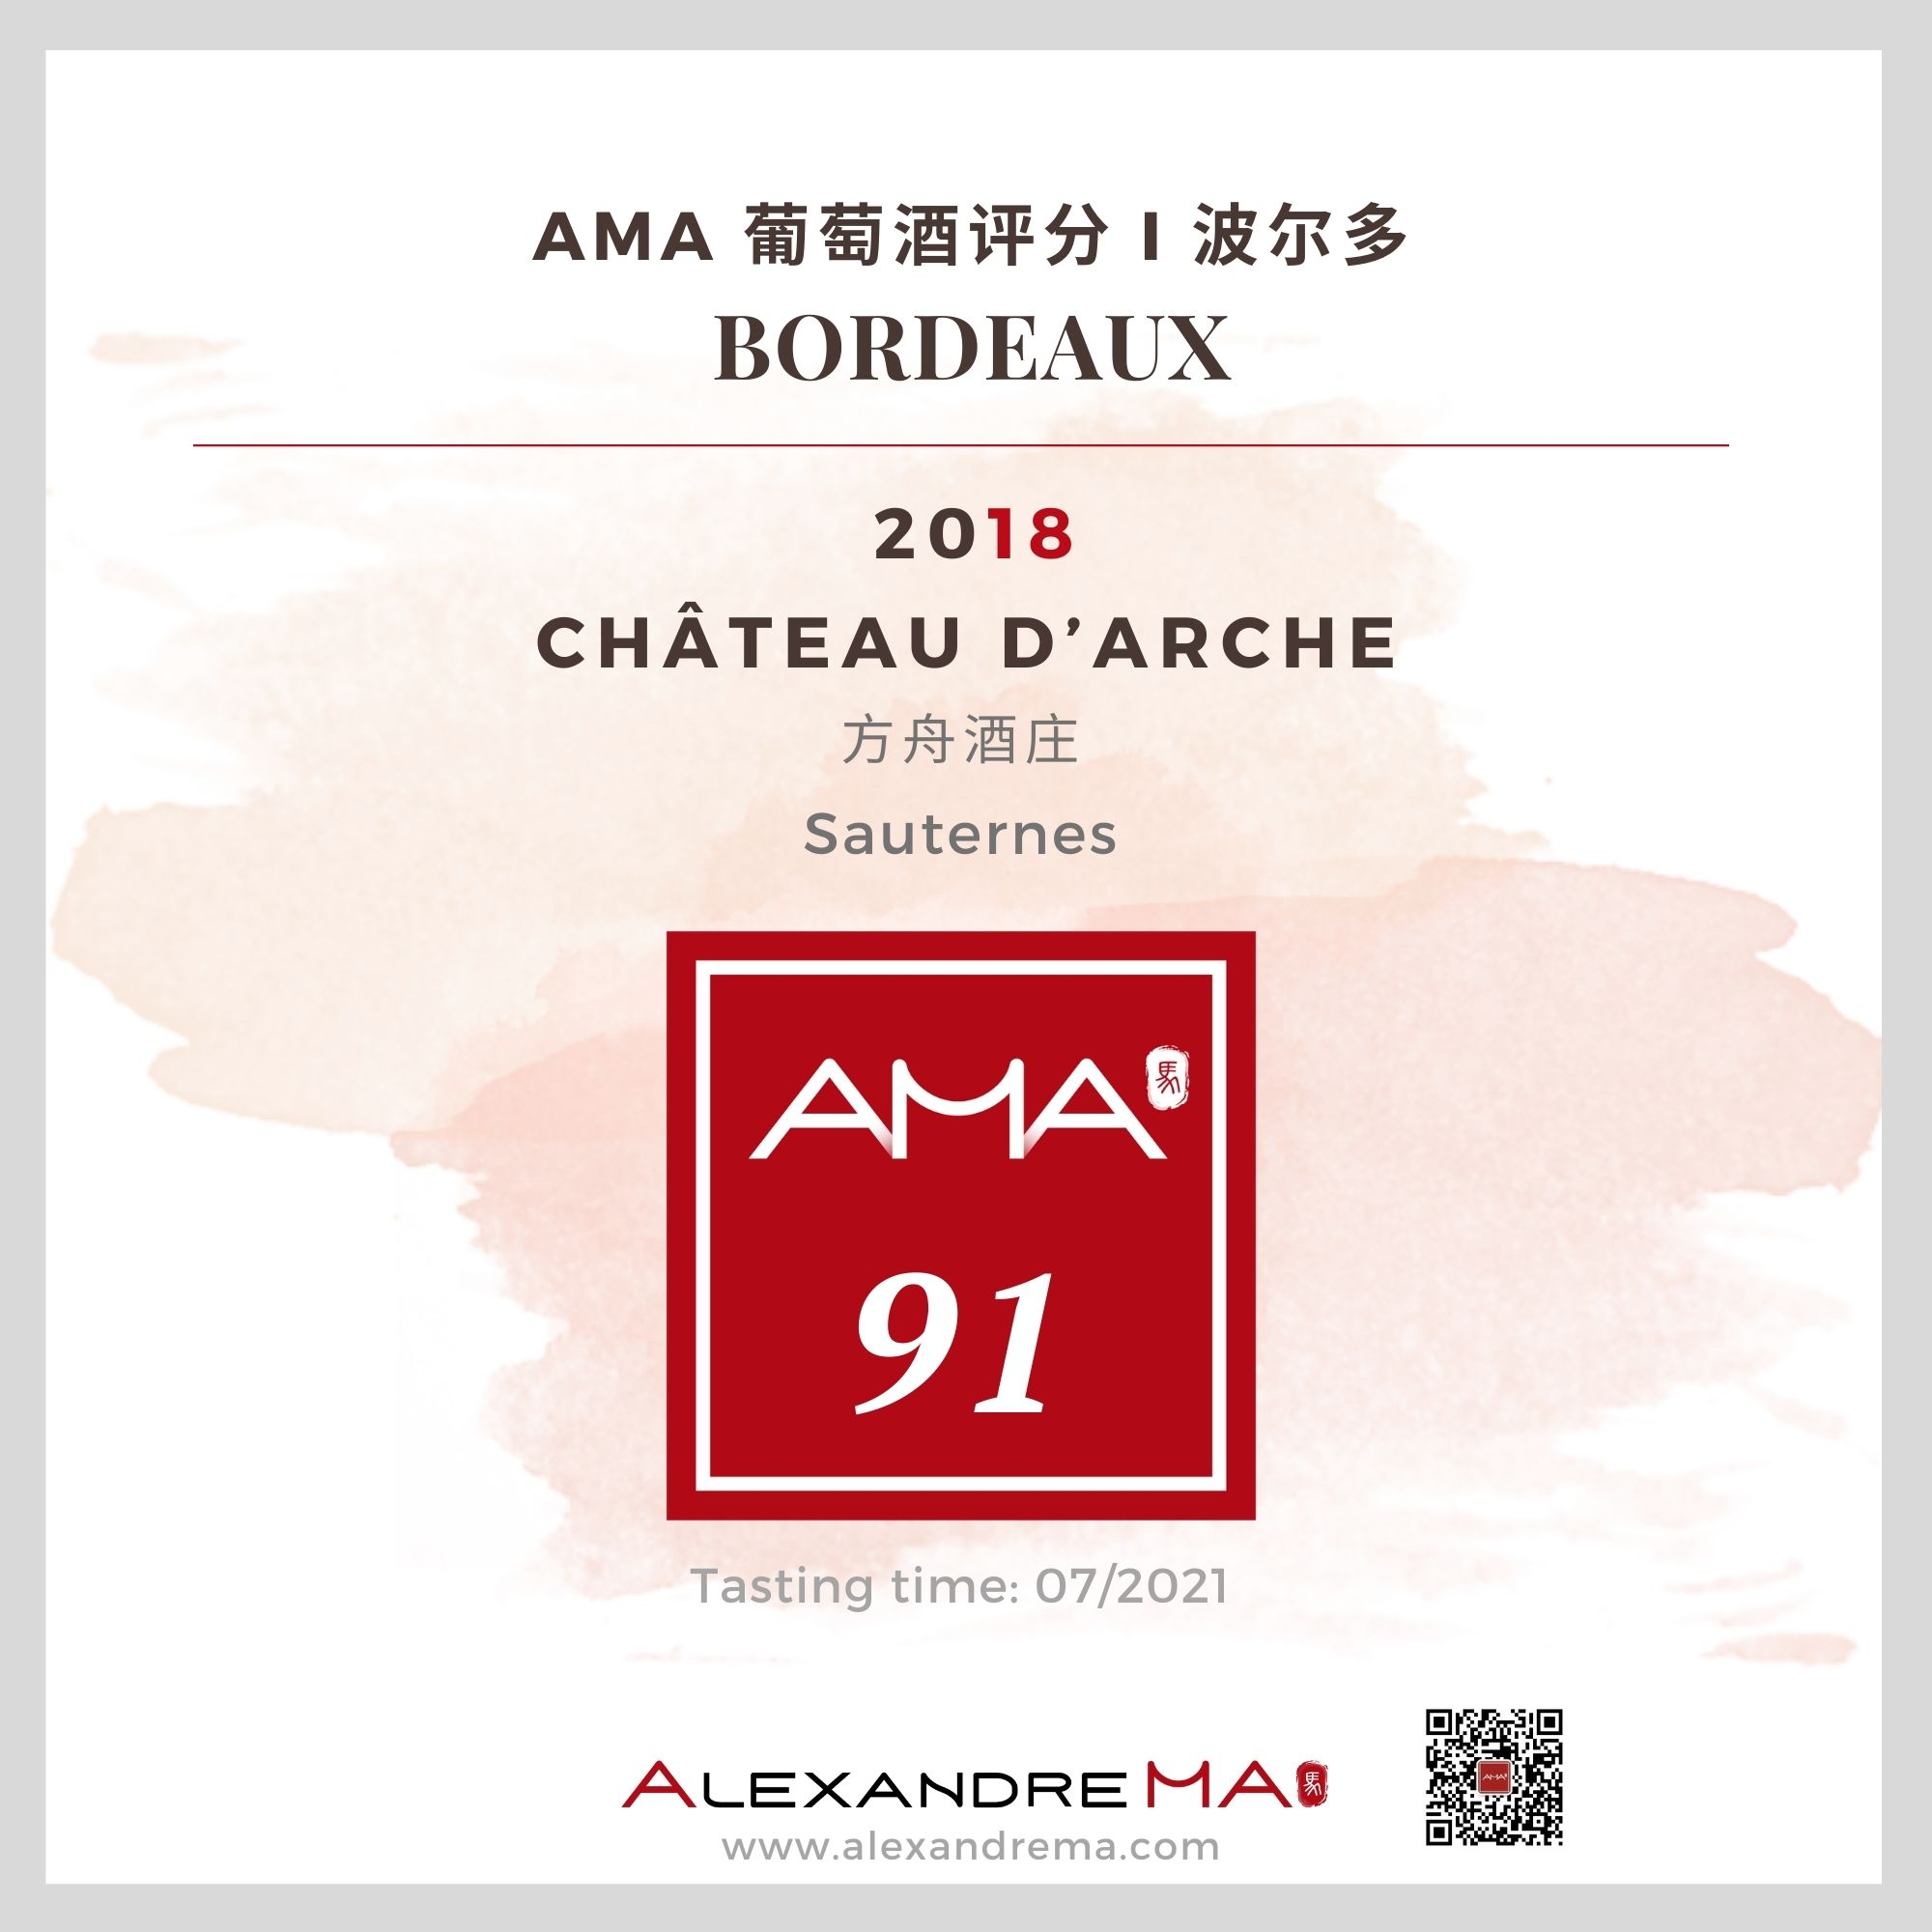 Château d'Arche 2018 方舟酒庄 - Alexandre Ma